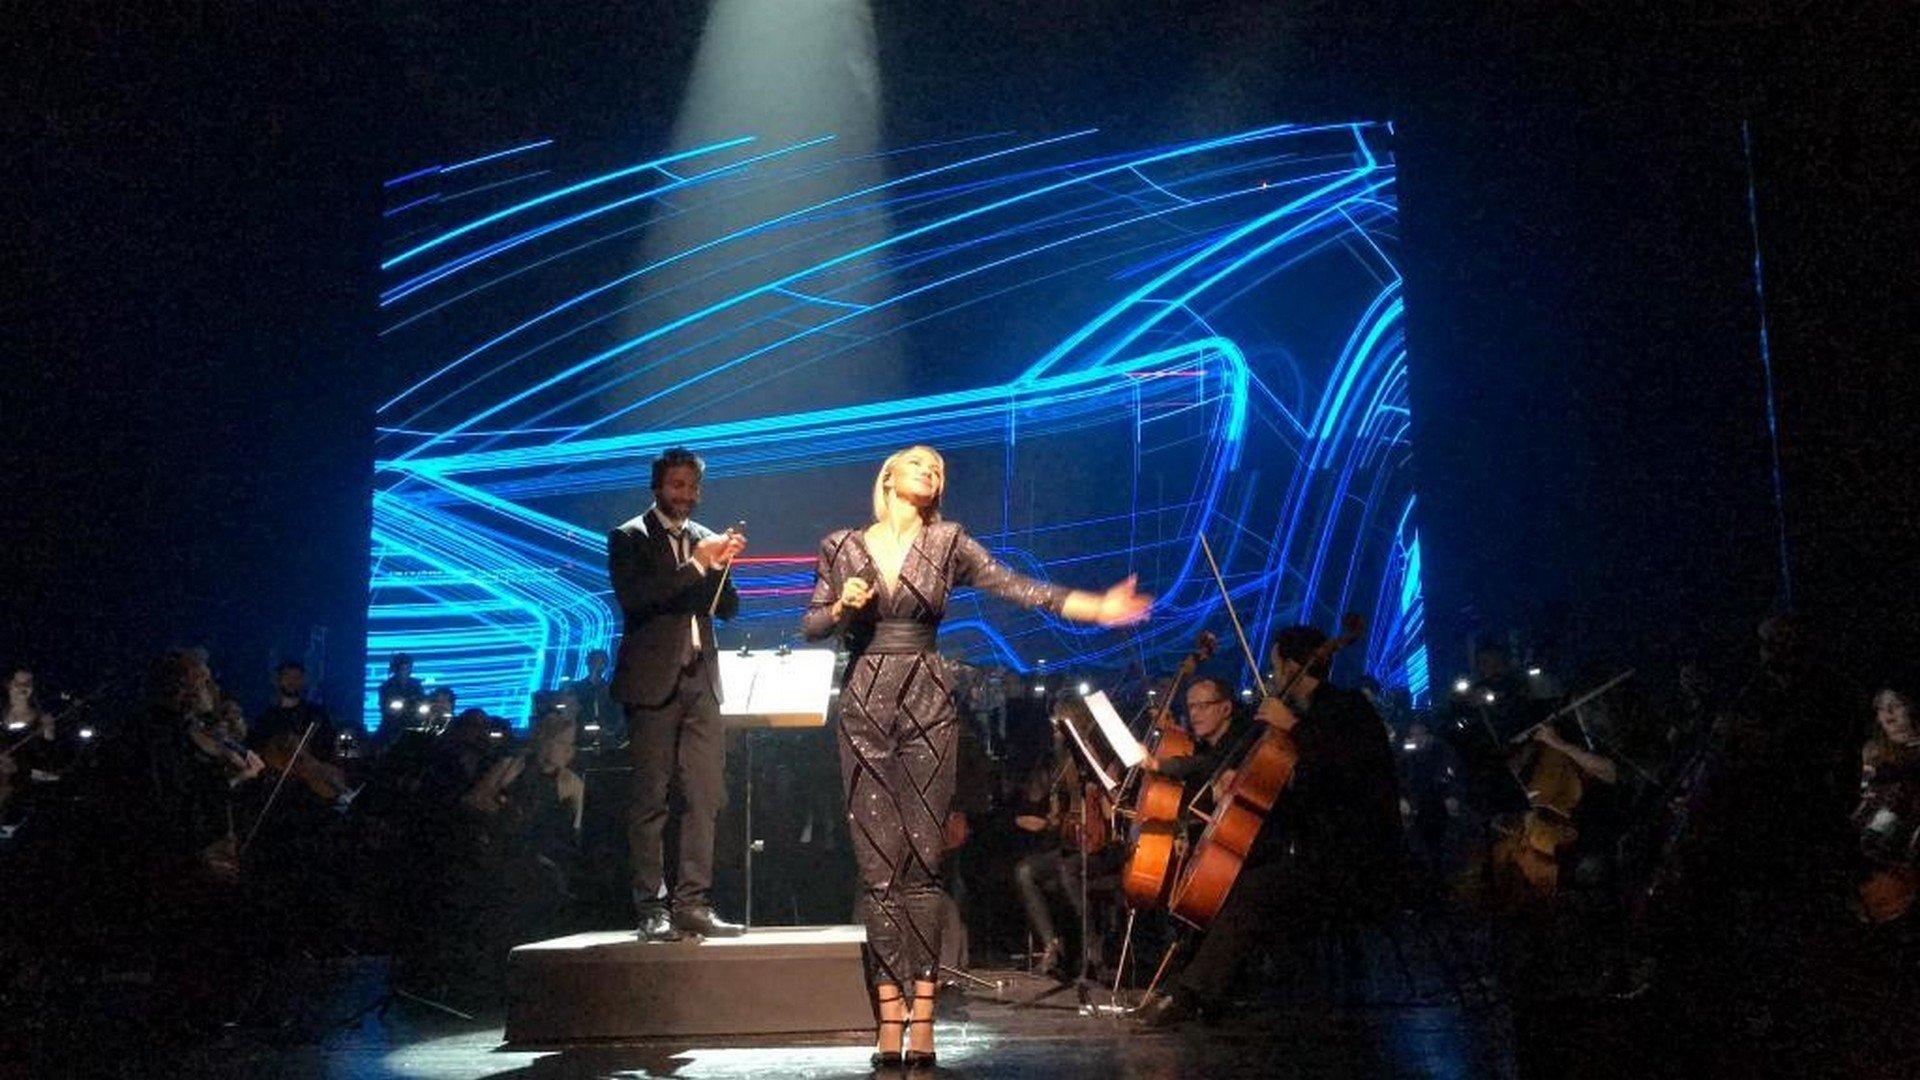 Het symfonische orkest in het Madrileense Real Teatro ontroert Kate Ryan - Kate Ryan 8